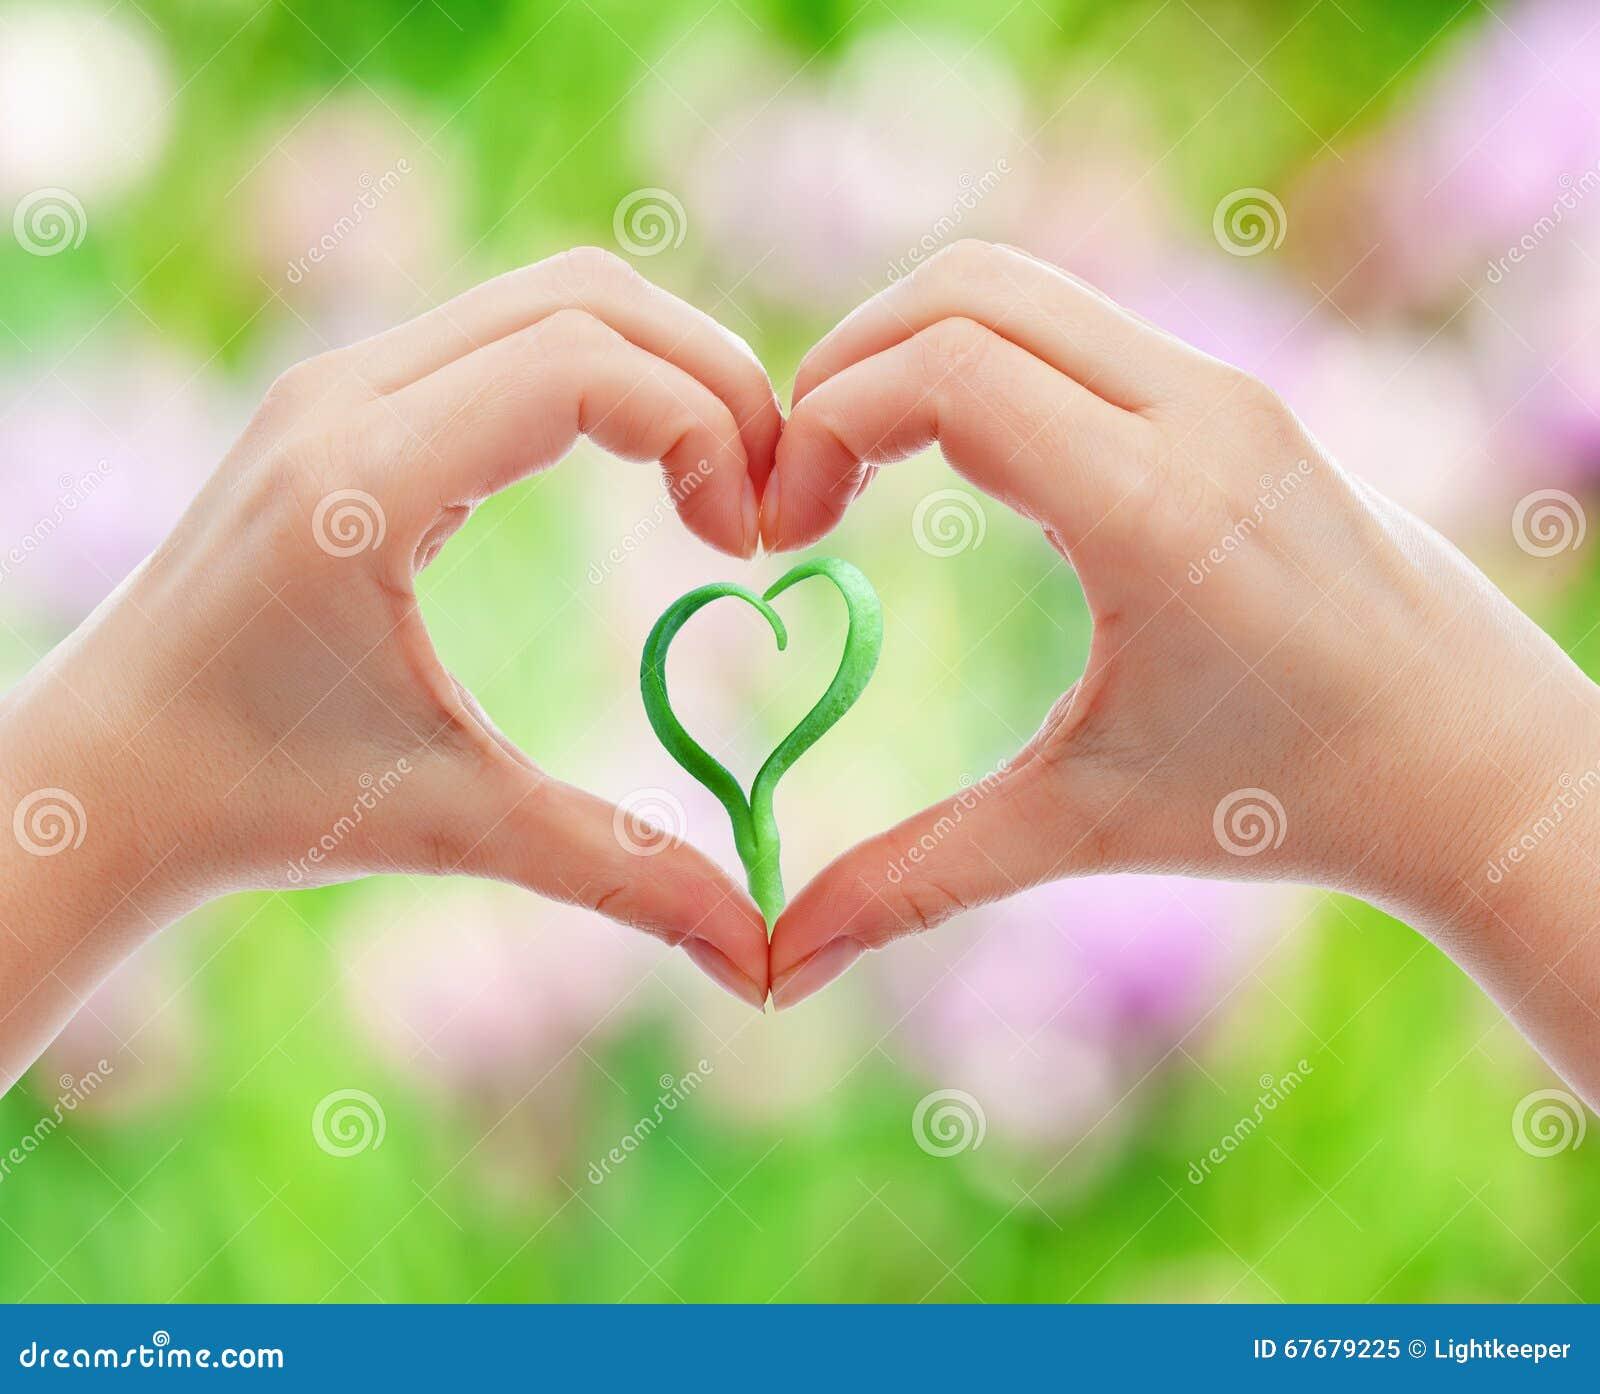 Ame e proteja a natureza e a vida